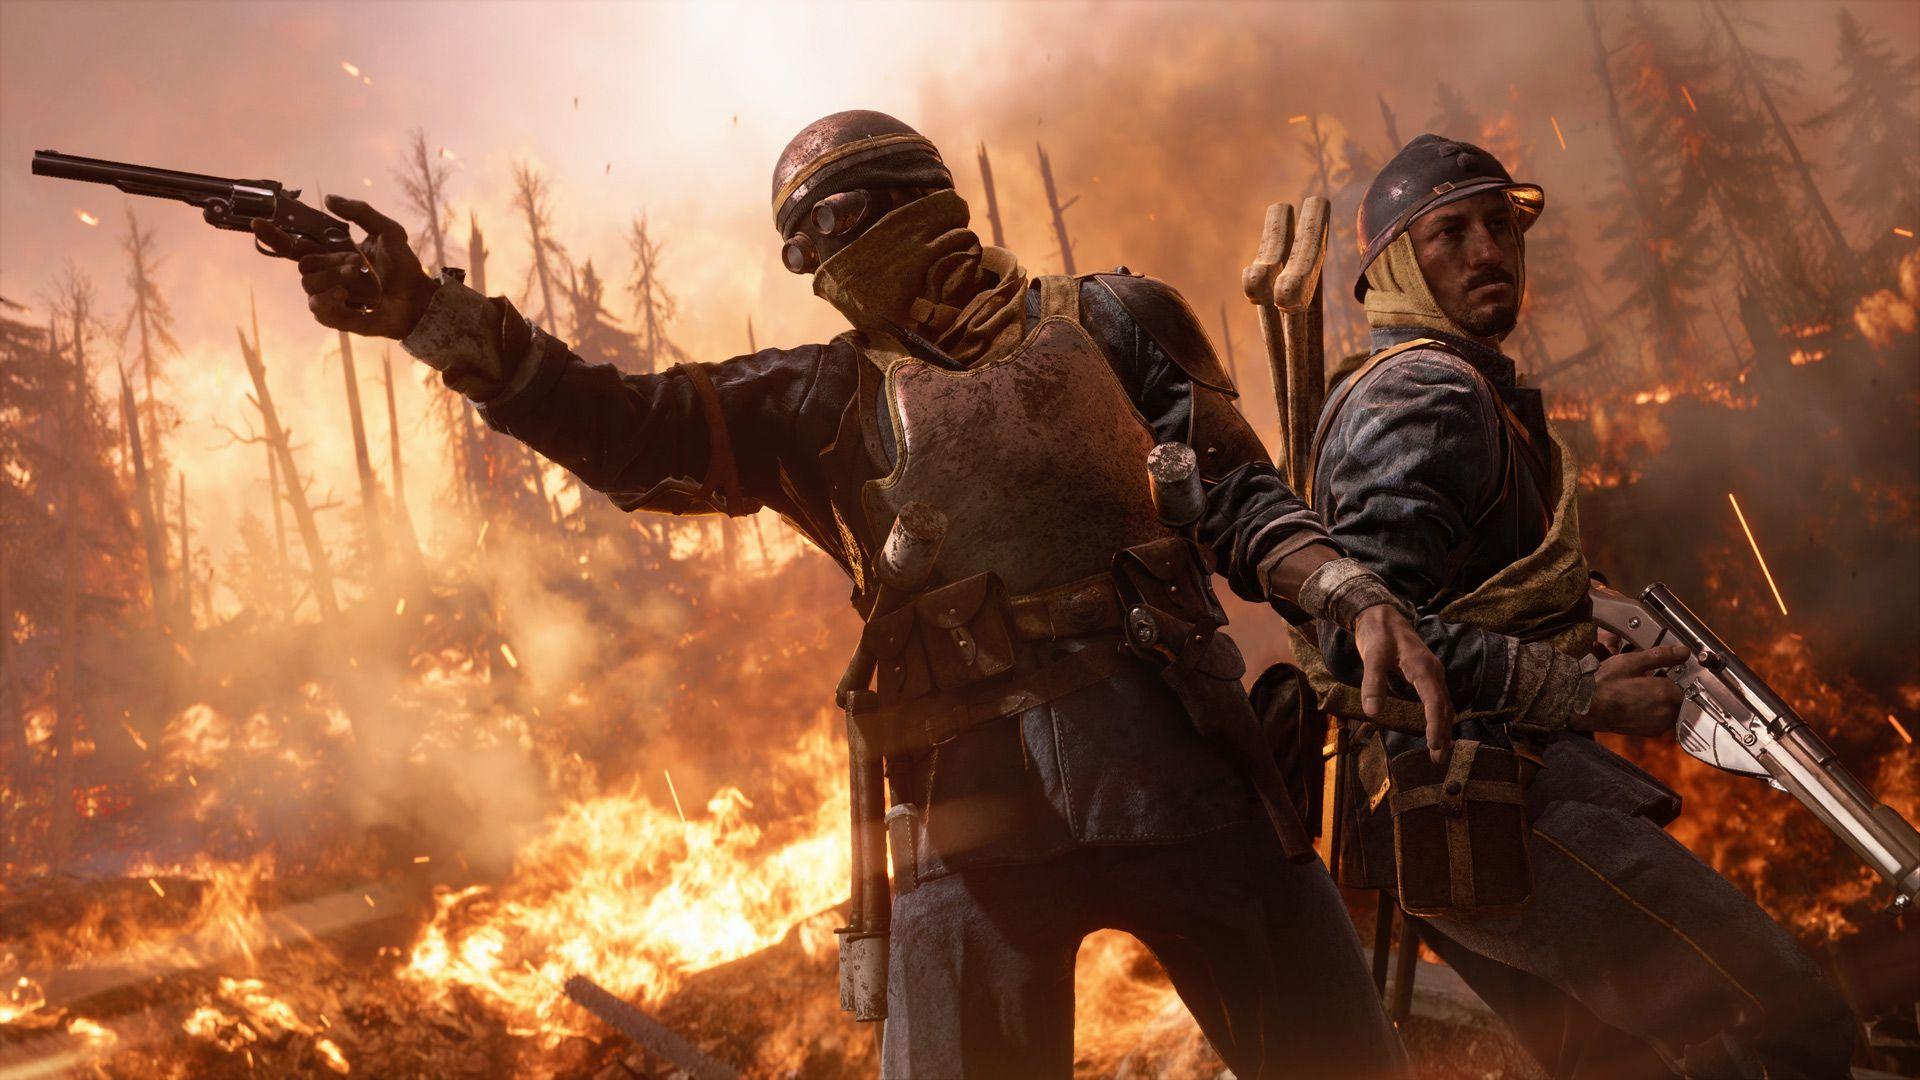 Artwork Battlefield 1 Battlefield 1 Battlefield Battle Of